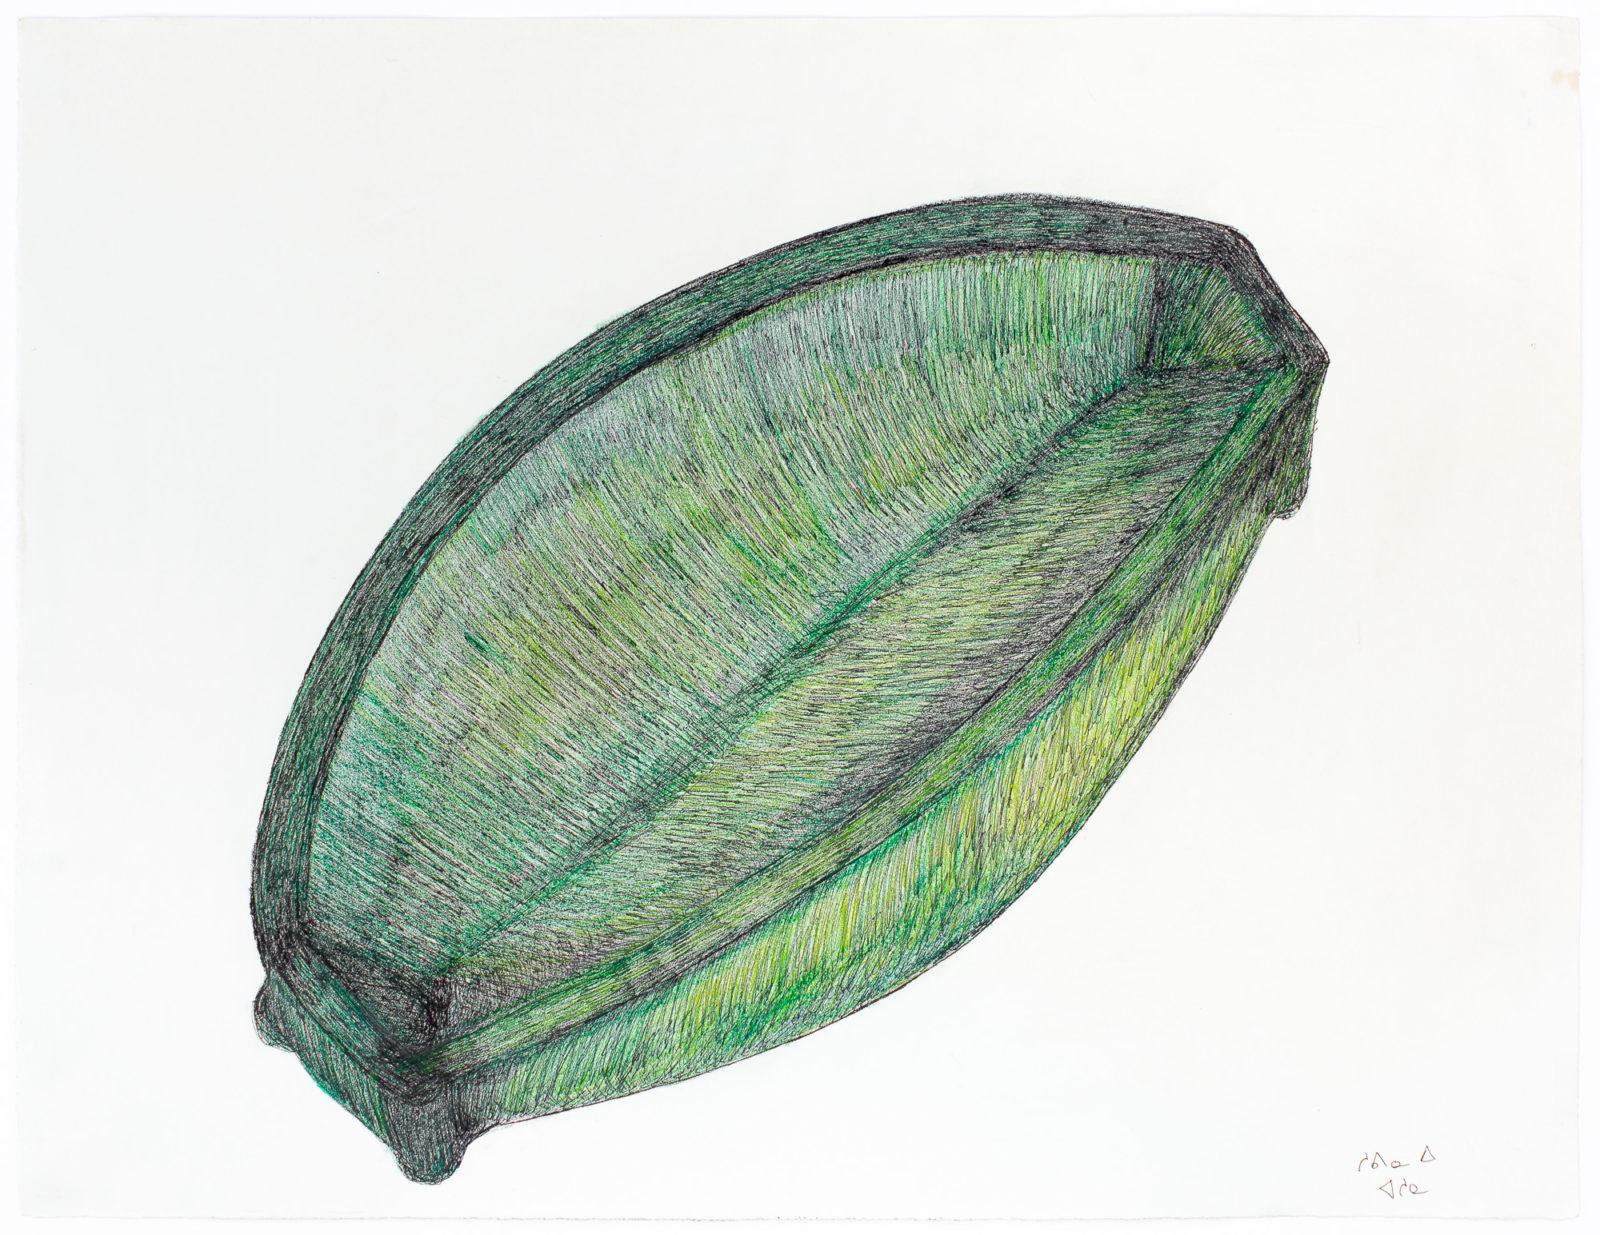 Shuvinai Ashoona - untitled (kudluq - oil lamp)